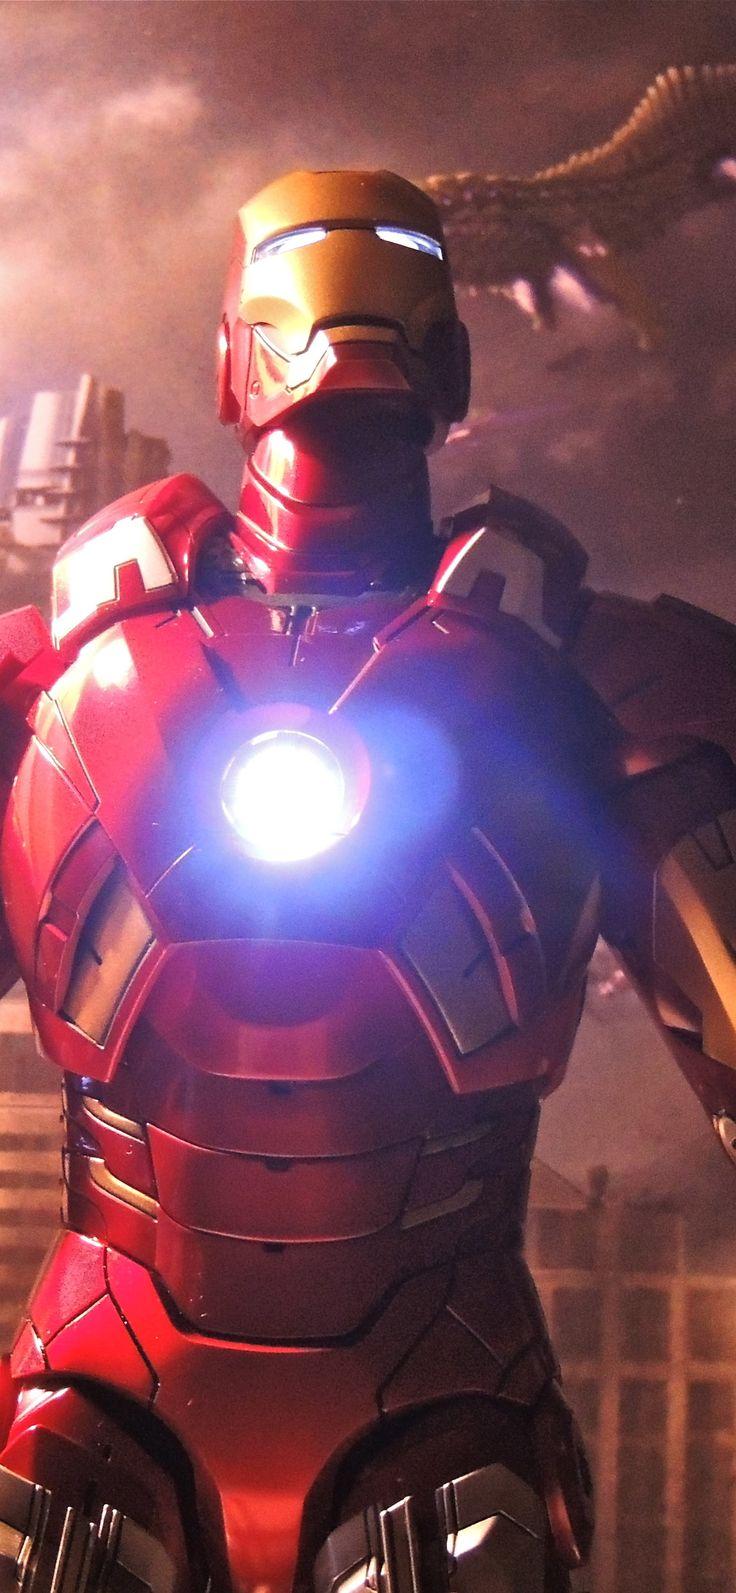 Iphone Hintergrundbild 1125x2436 Iron Man 2018 5k Kunstwerk